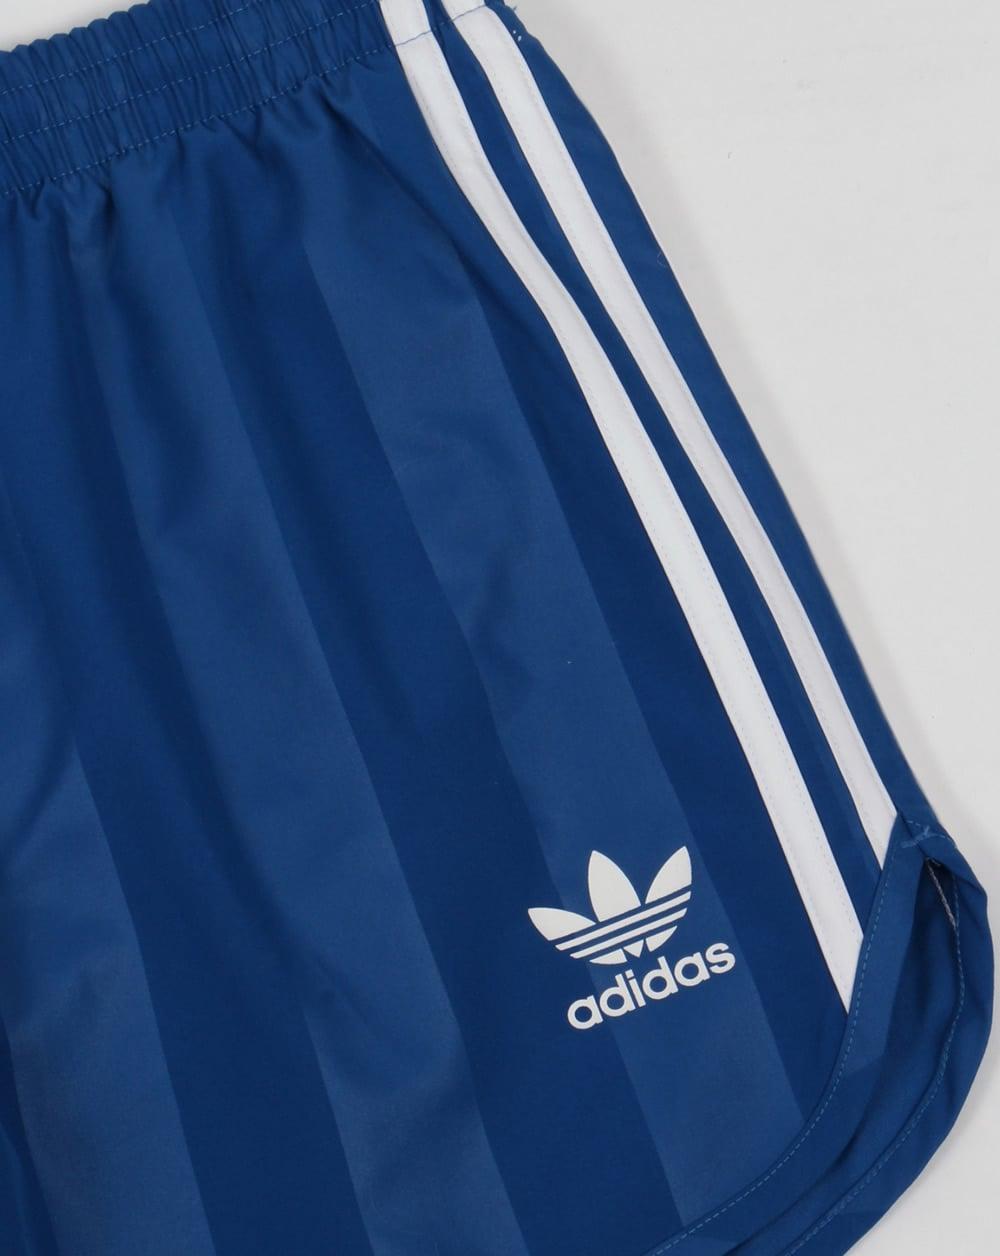 b8630d9575 Adidas Originals Football Shorts Royal Blue - eqt - Shorts from 80s ...